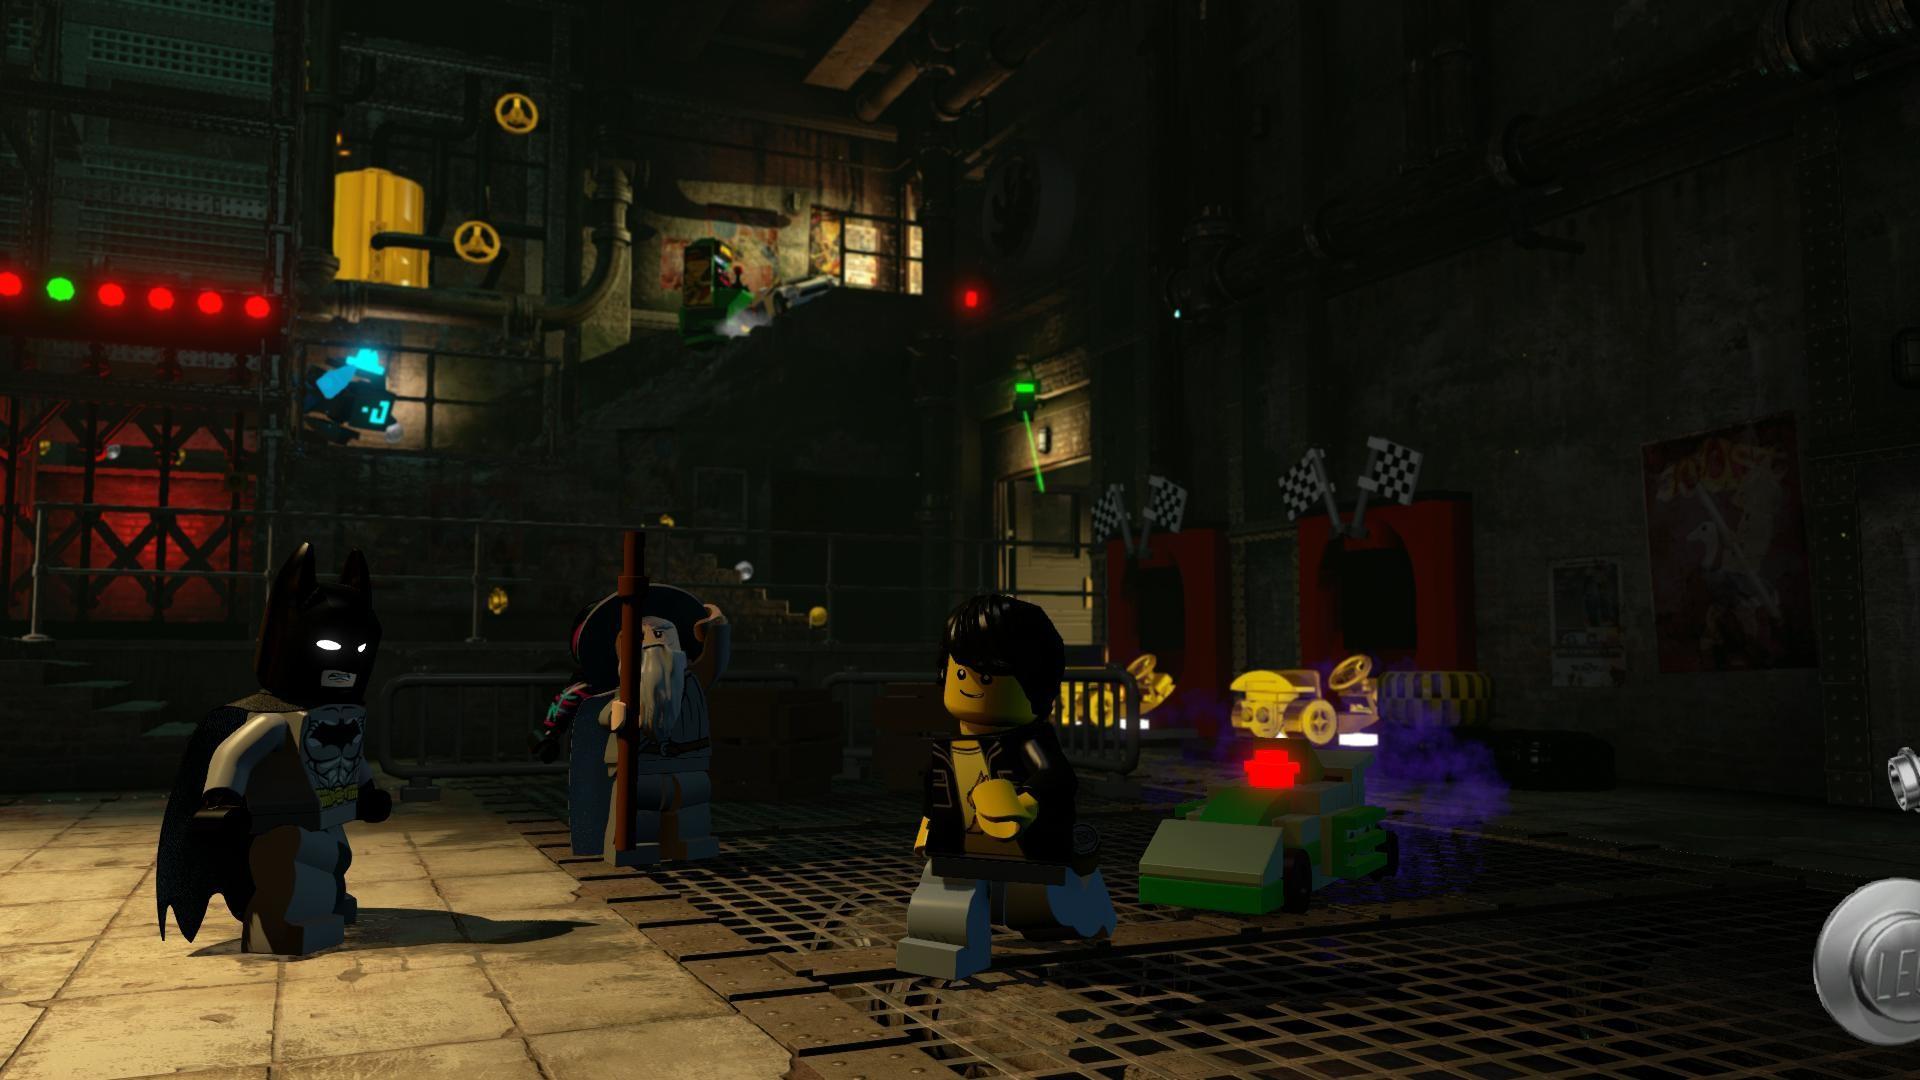 LEGO_Dimensions_Gamer_Kid_10_bmp_jpgcopy